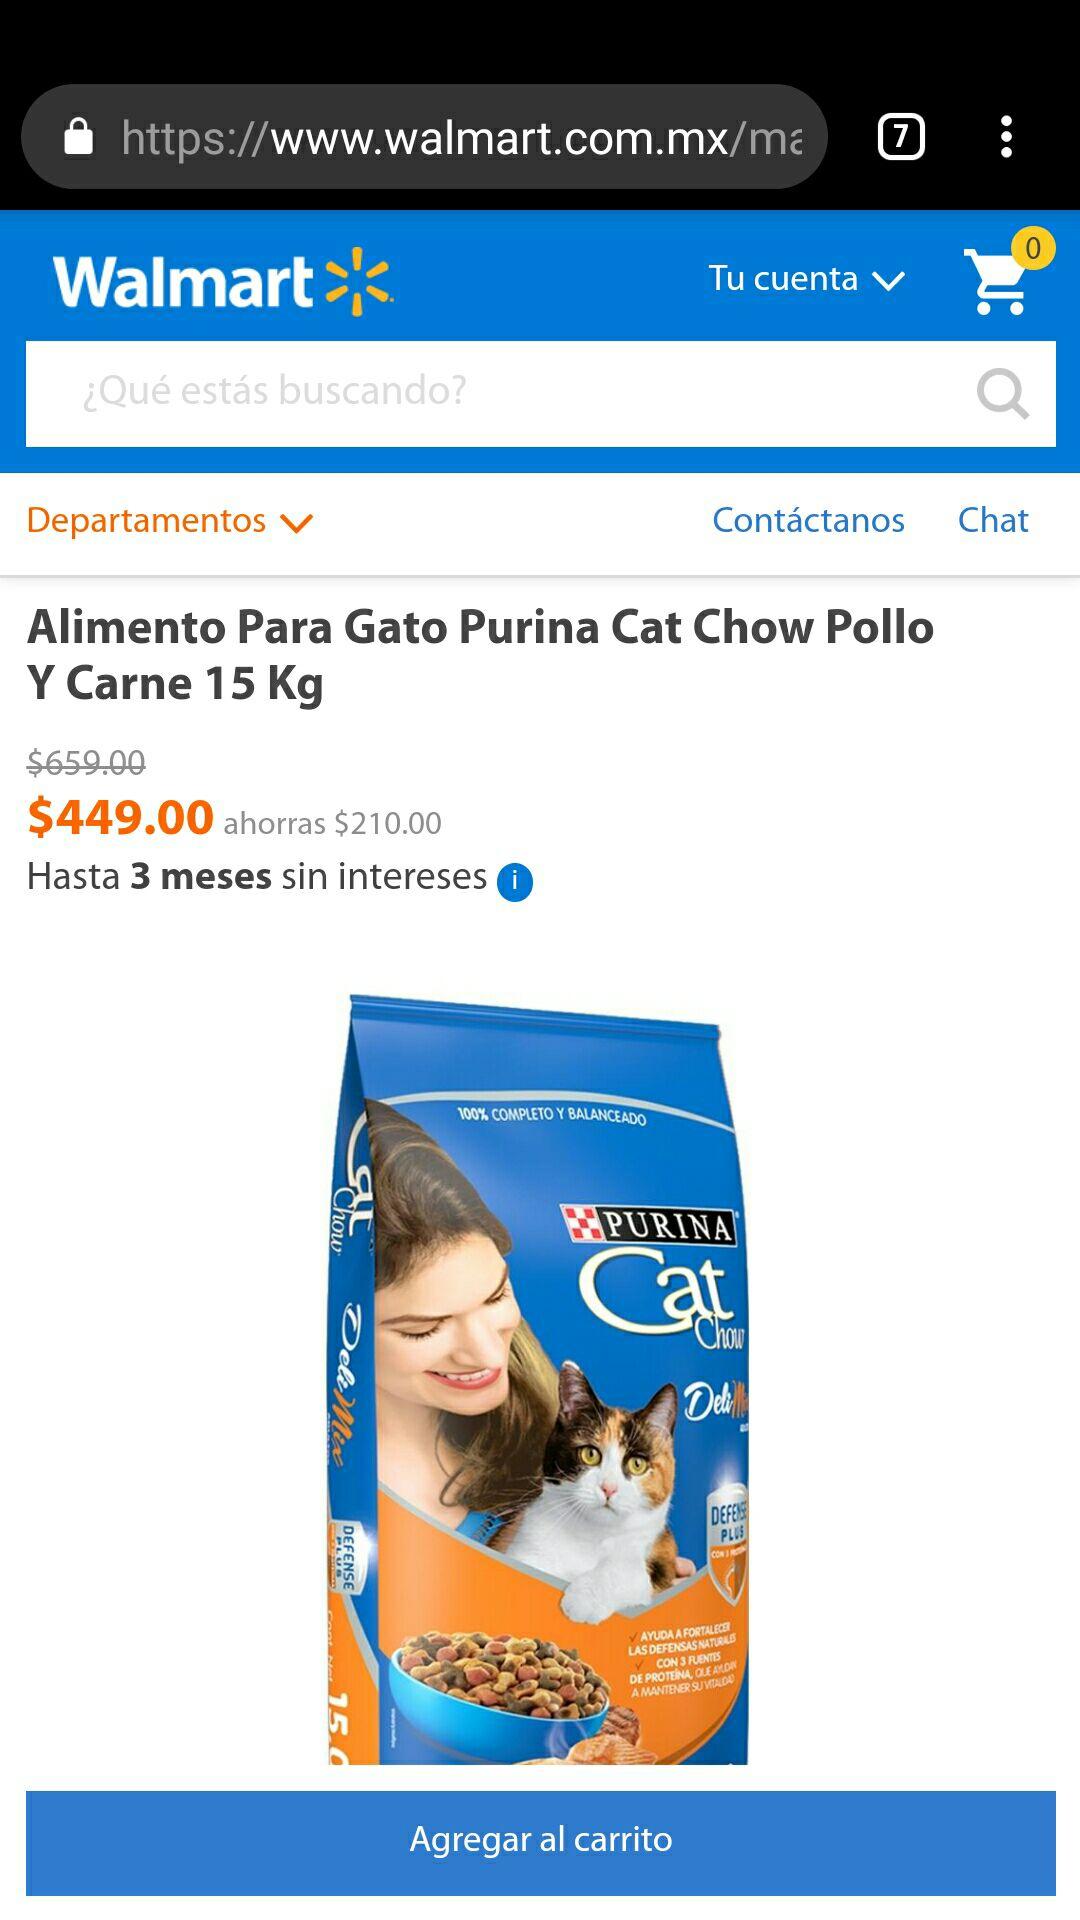 Walmart online: Purina Cat chow pollo y carne 15 kg envío gratis!!!